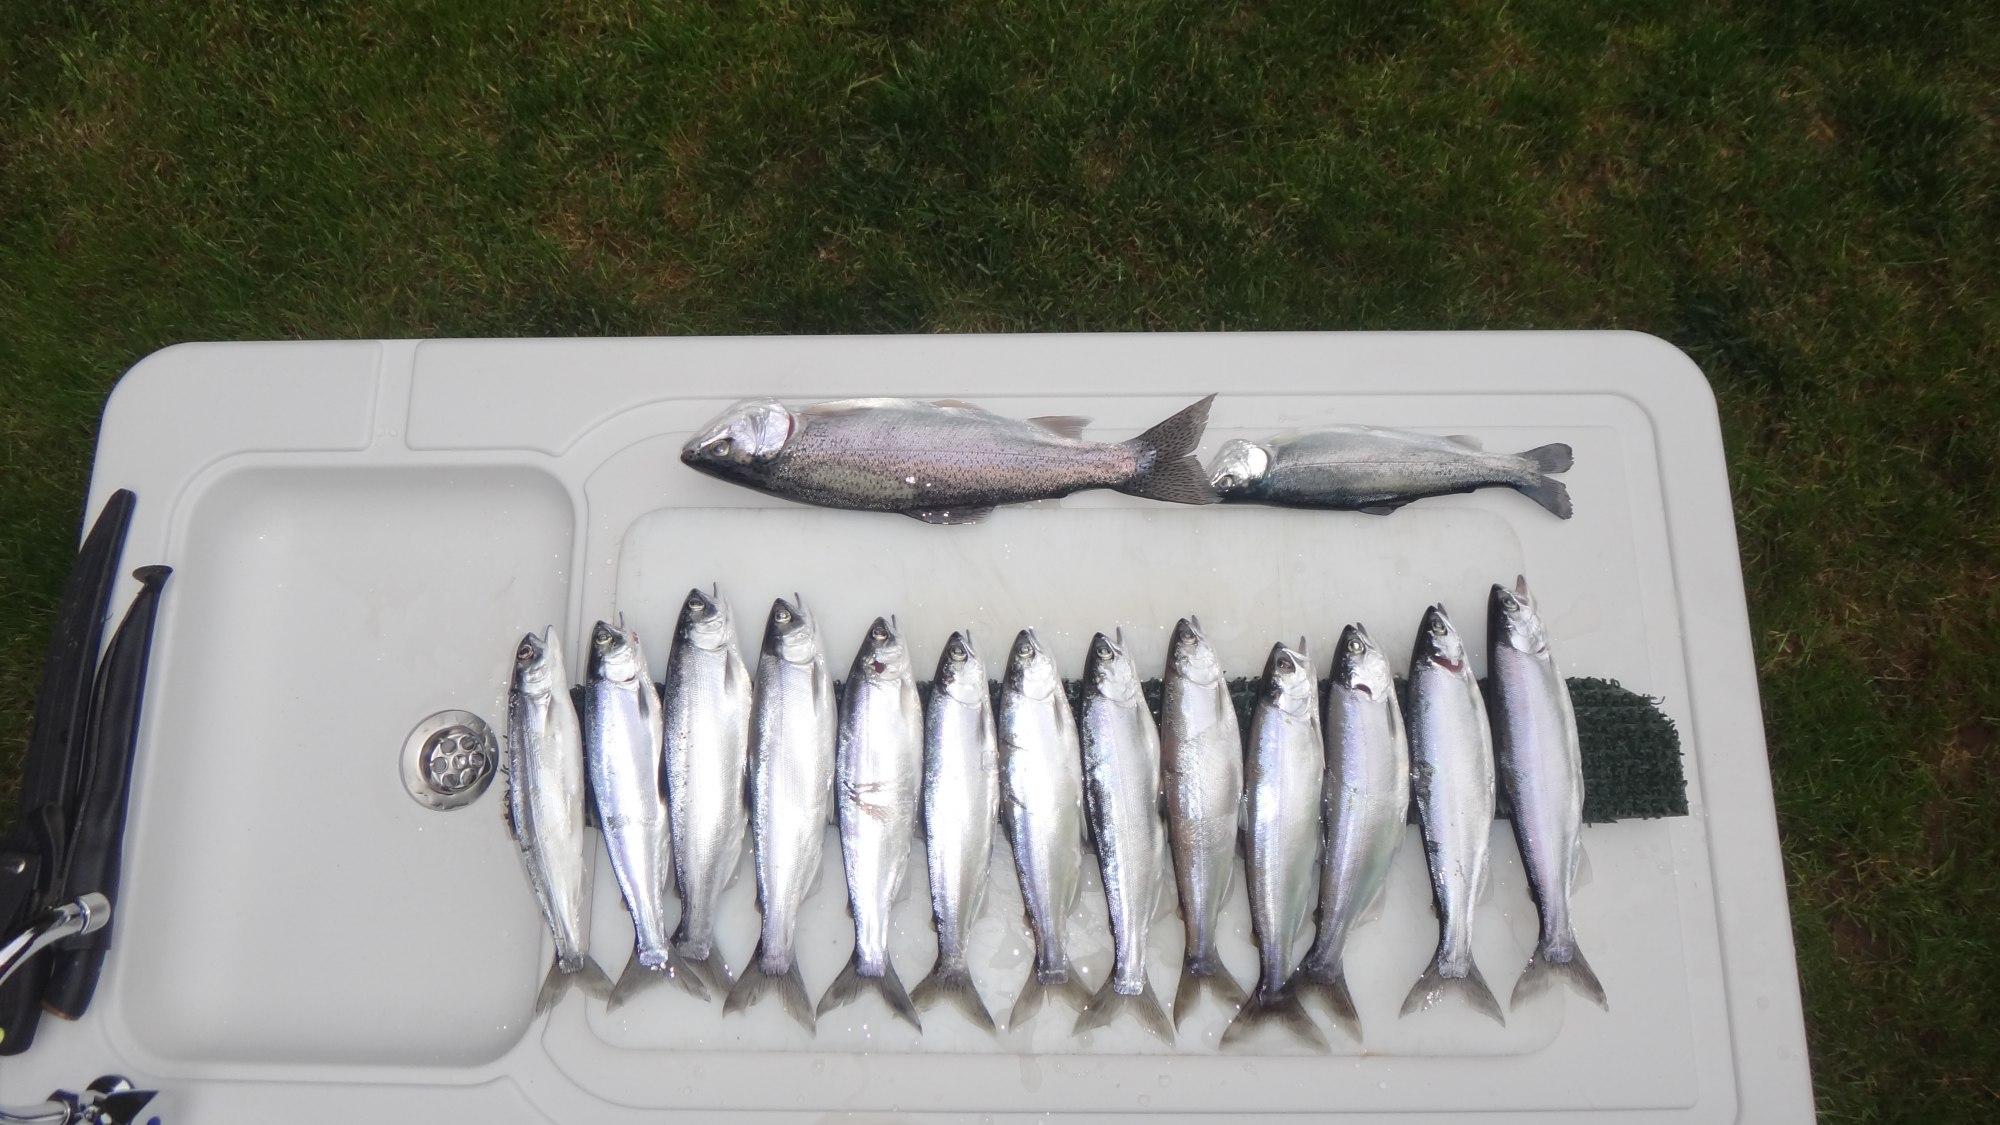 Angler Brad Halleck Fish of the Week April 21, 2013